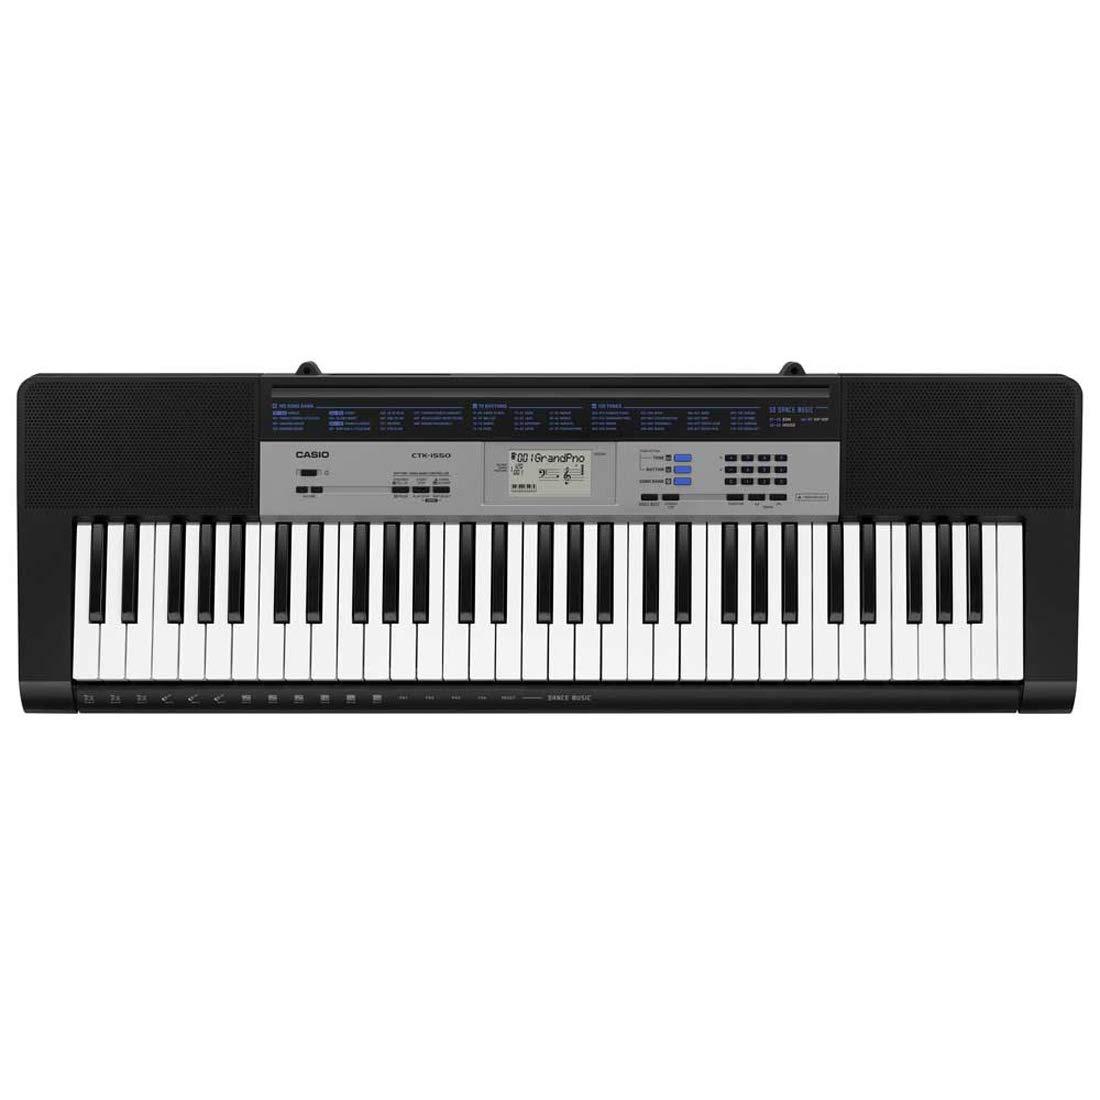 c90991b5b54 Casio CTK-1550 61-Key Standard Keyboard (Black): Amazon.in: Musical  Instruments